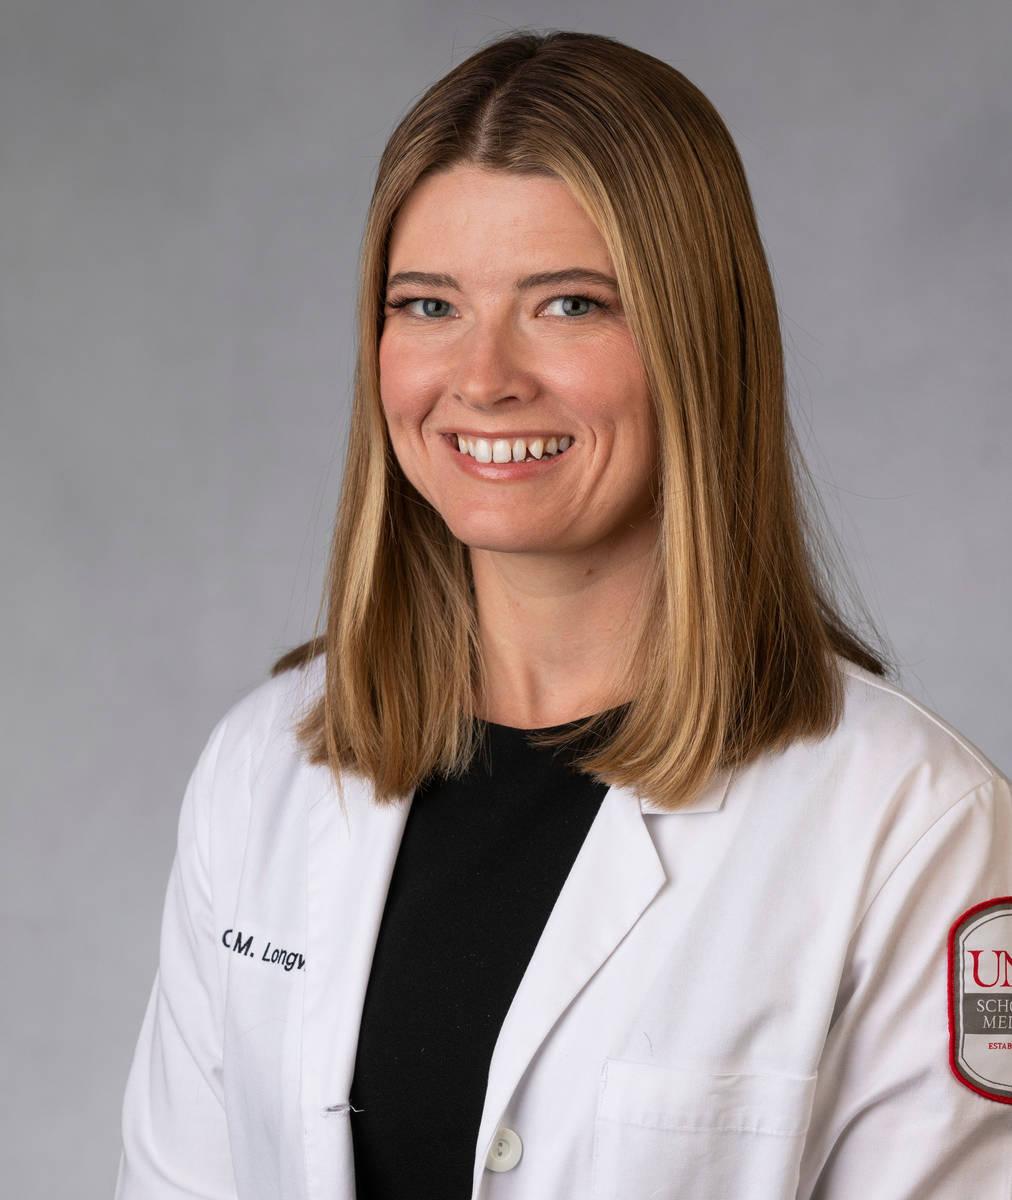 Caleena Longworth graduated from the UNLV Kirk Kerkorian School of Medicine in May 2021. (Lonni ...